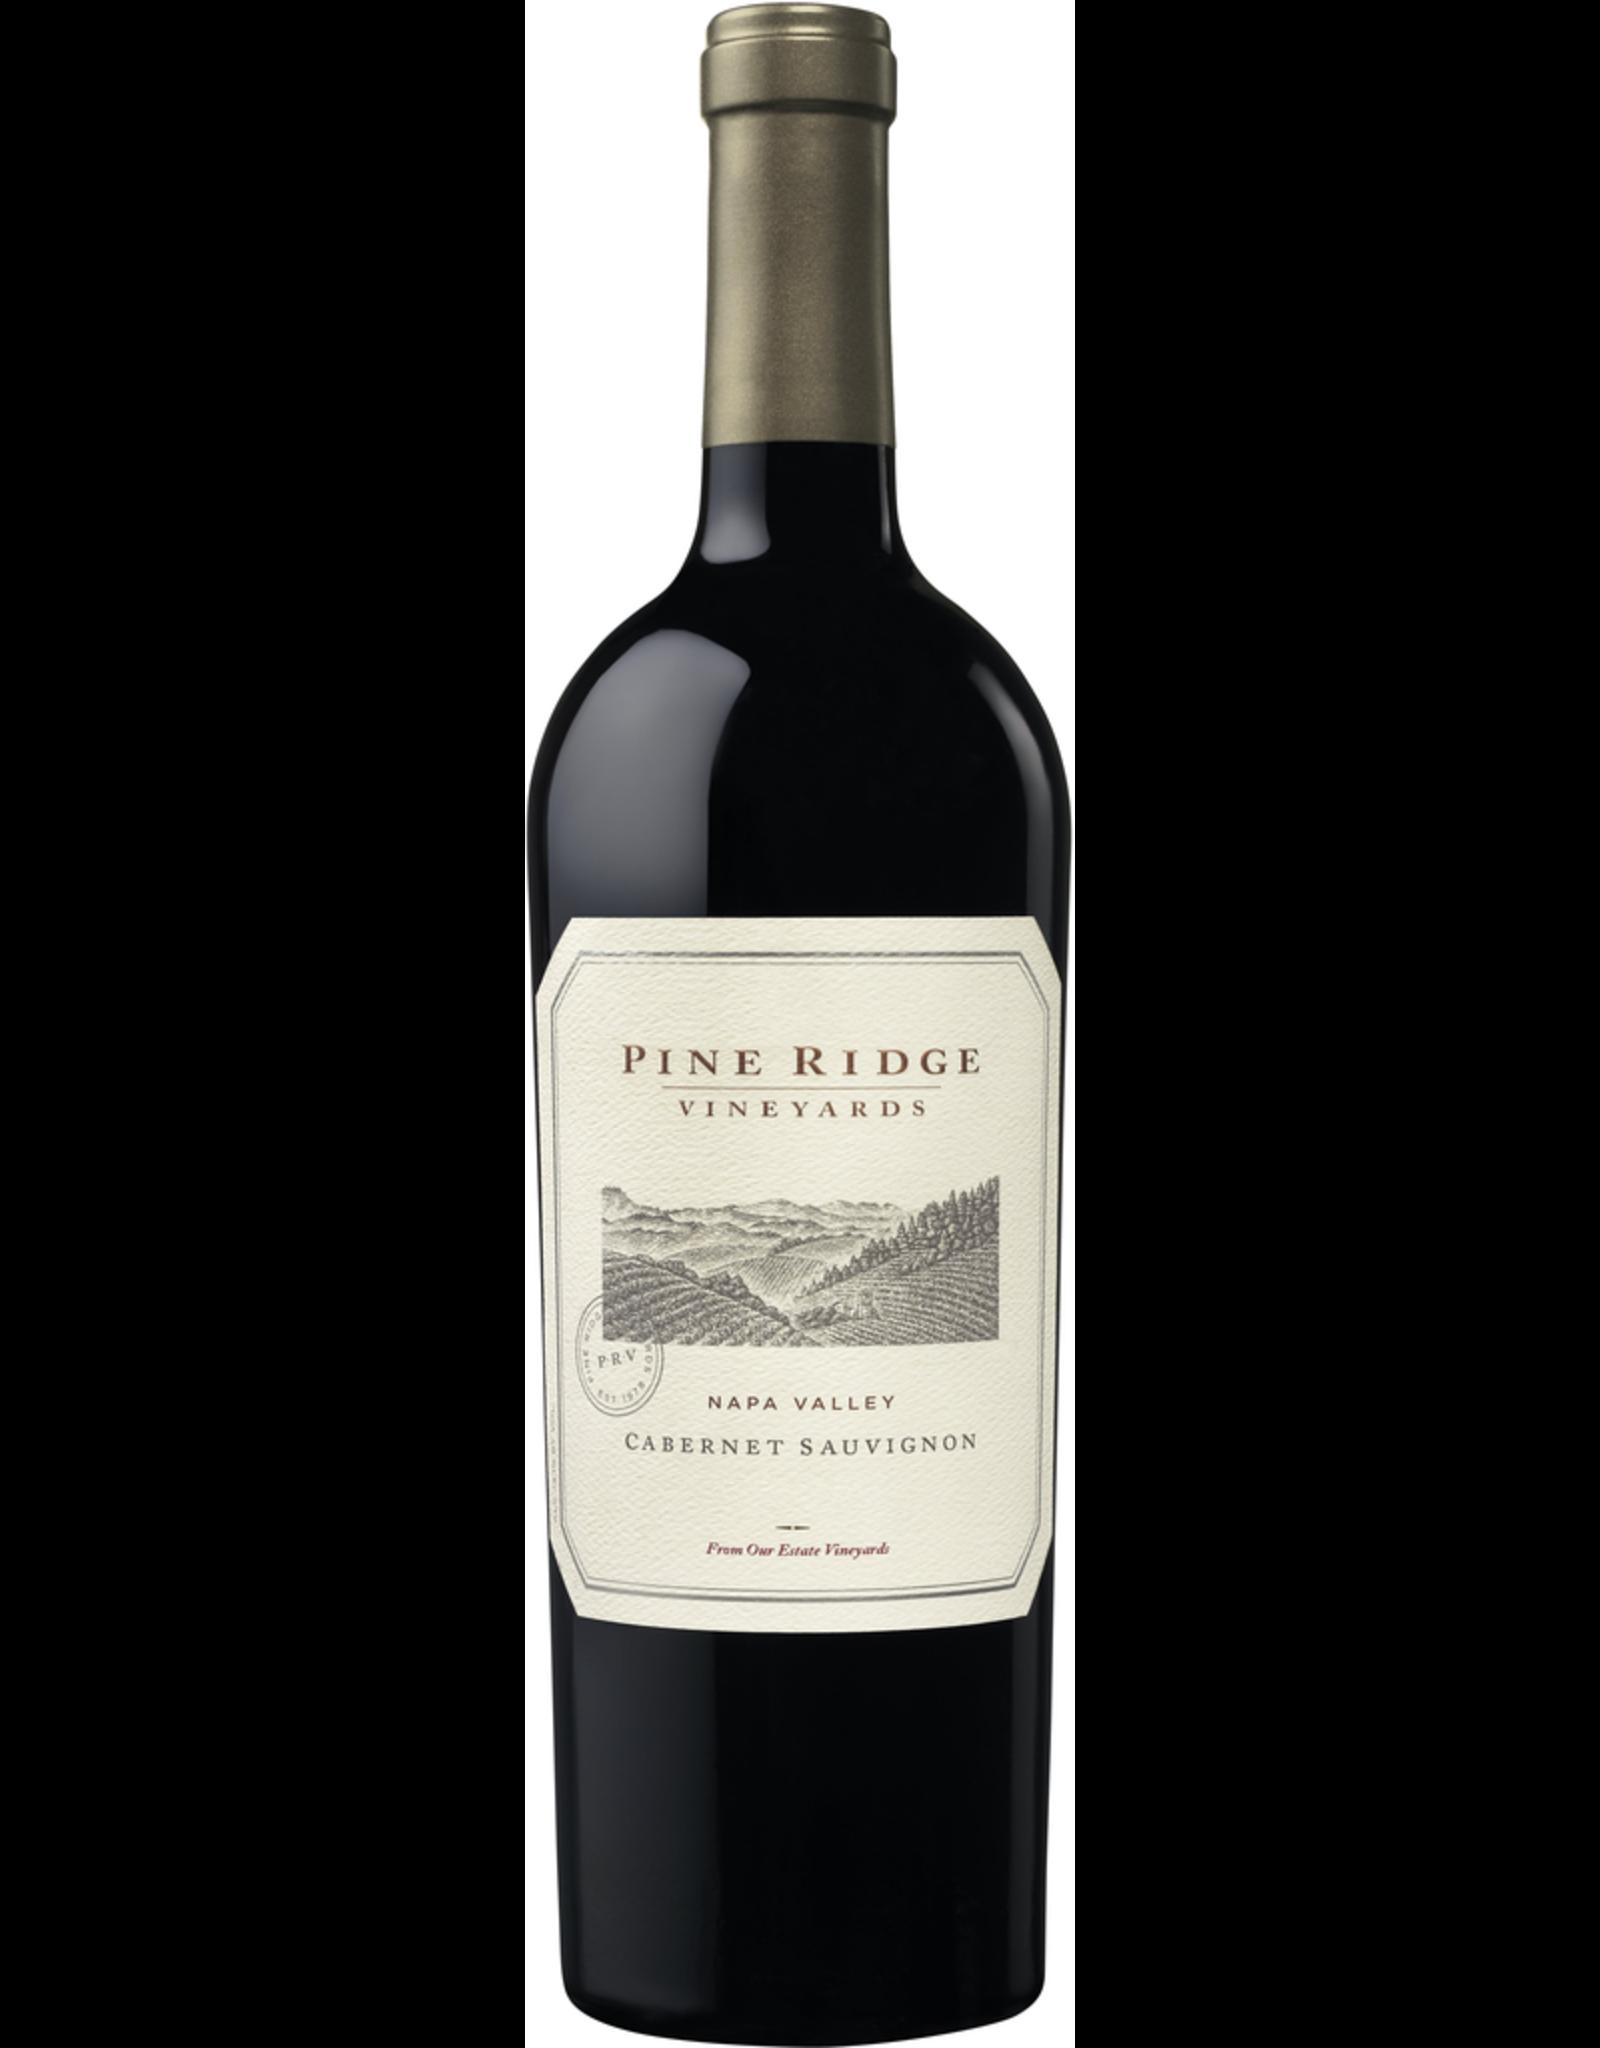 White Wine 2016, Pine Ridge, Cabernet Sauvignon, Napa Valley, California, USA, 14.8% Alc, CTnr, JS91, TW92